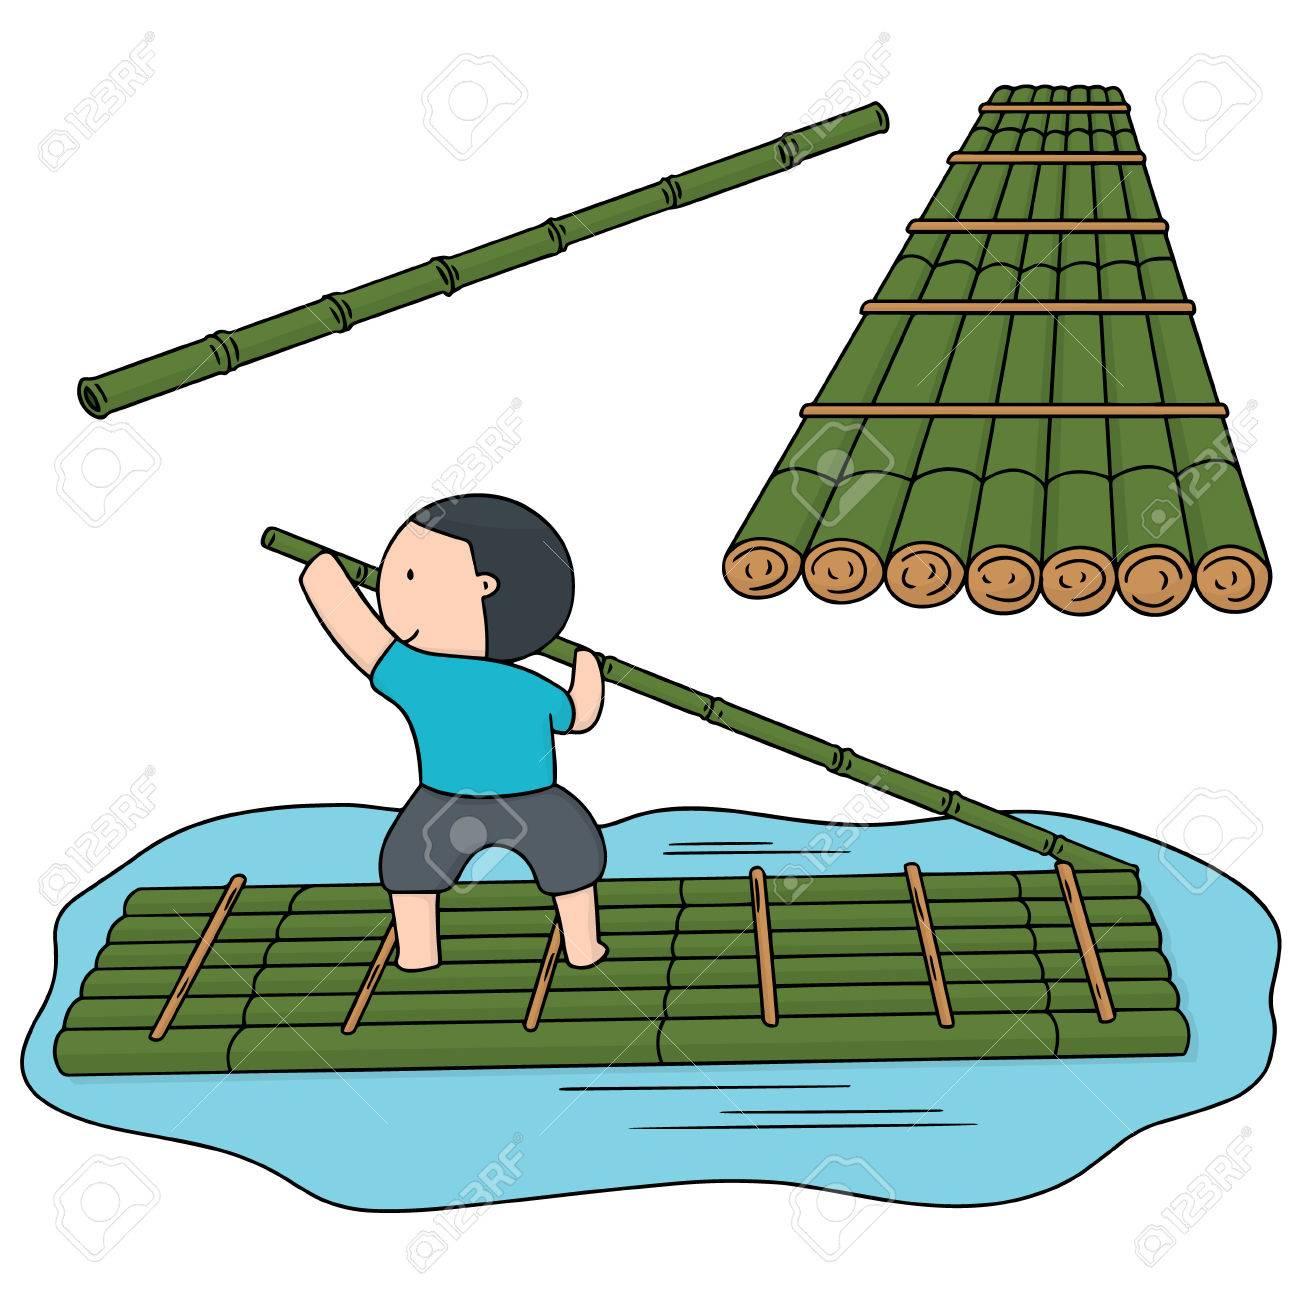 Bamboo Raft Clipart.